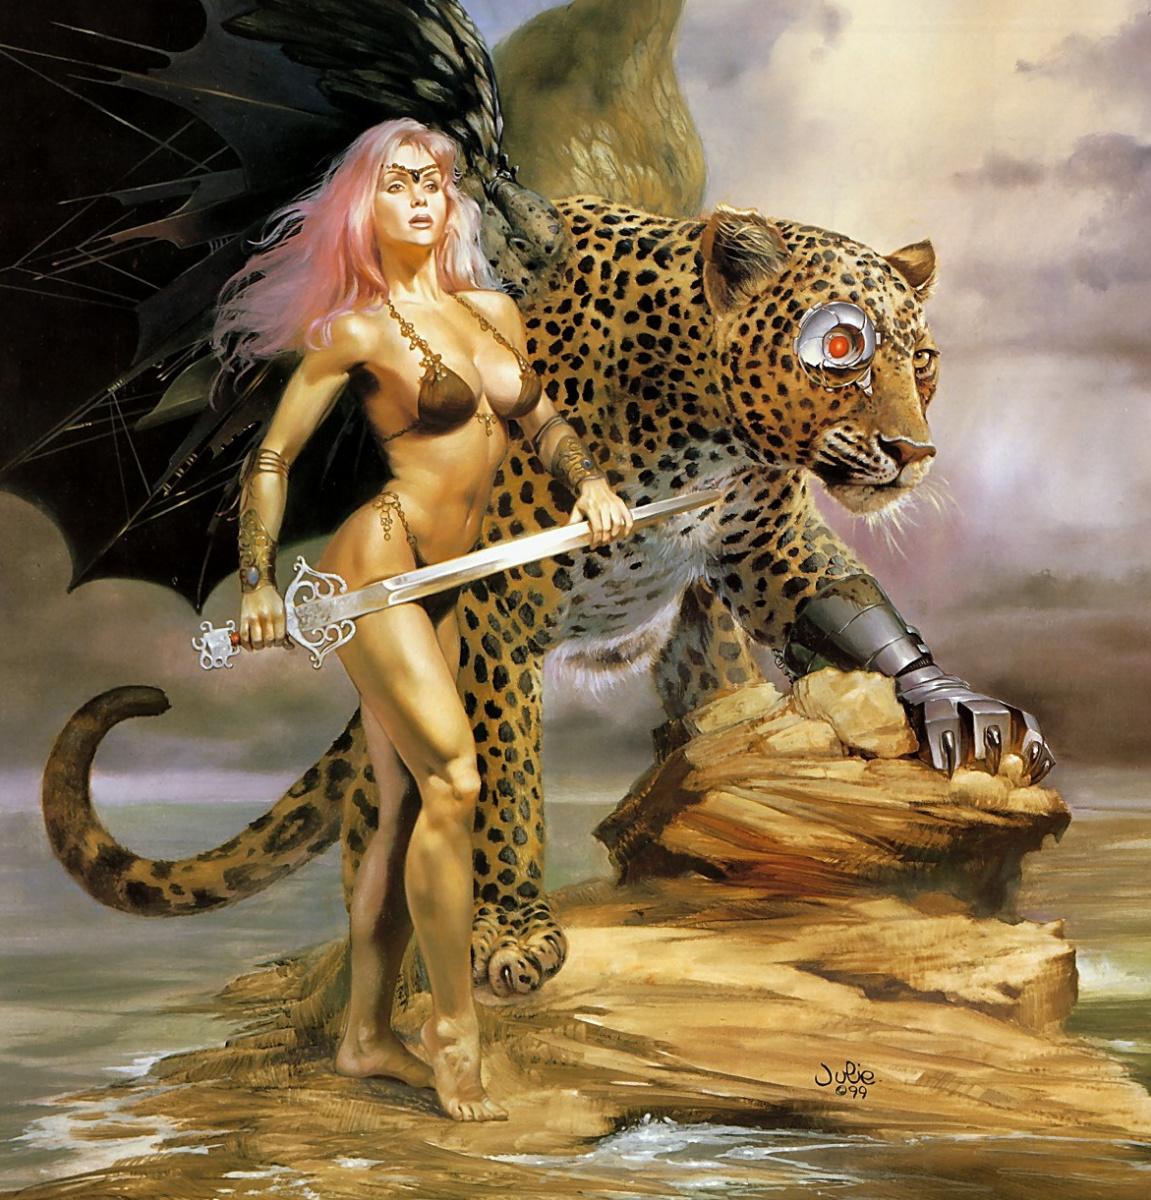 Sexy fantasy leopard porn naked photo